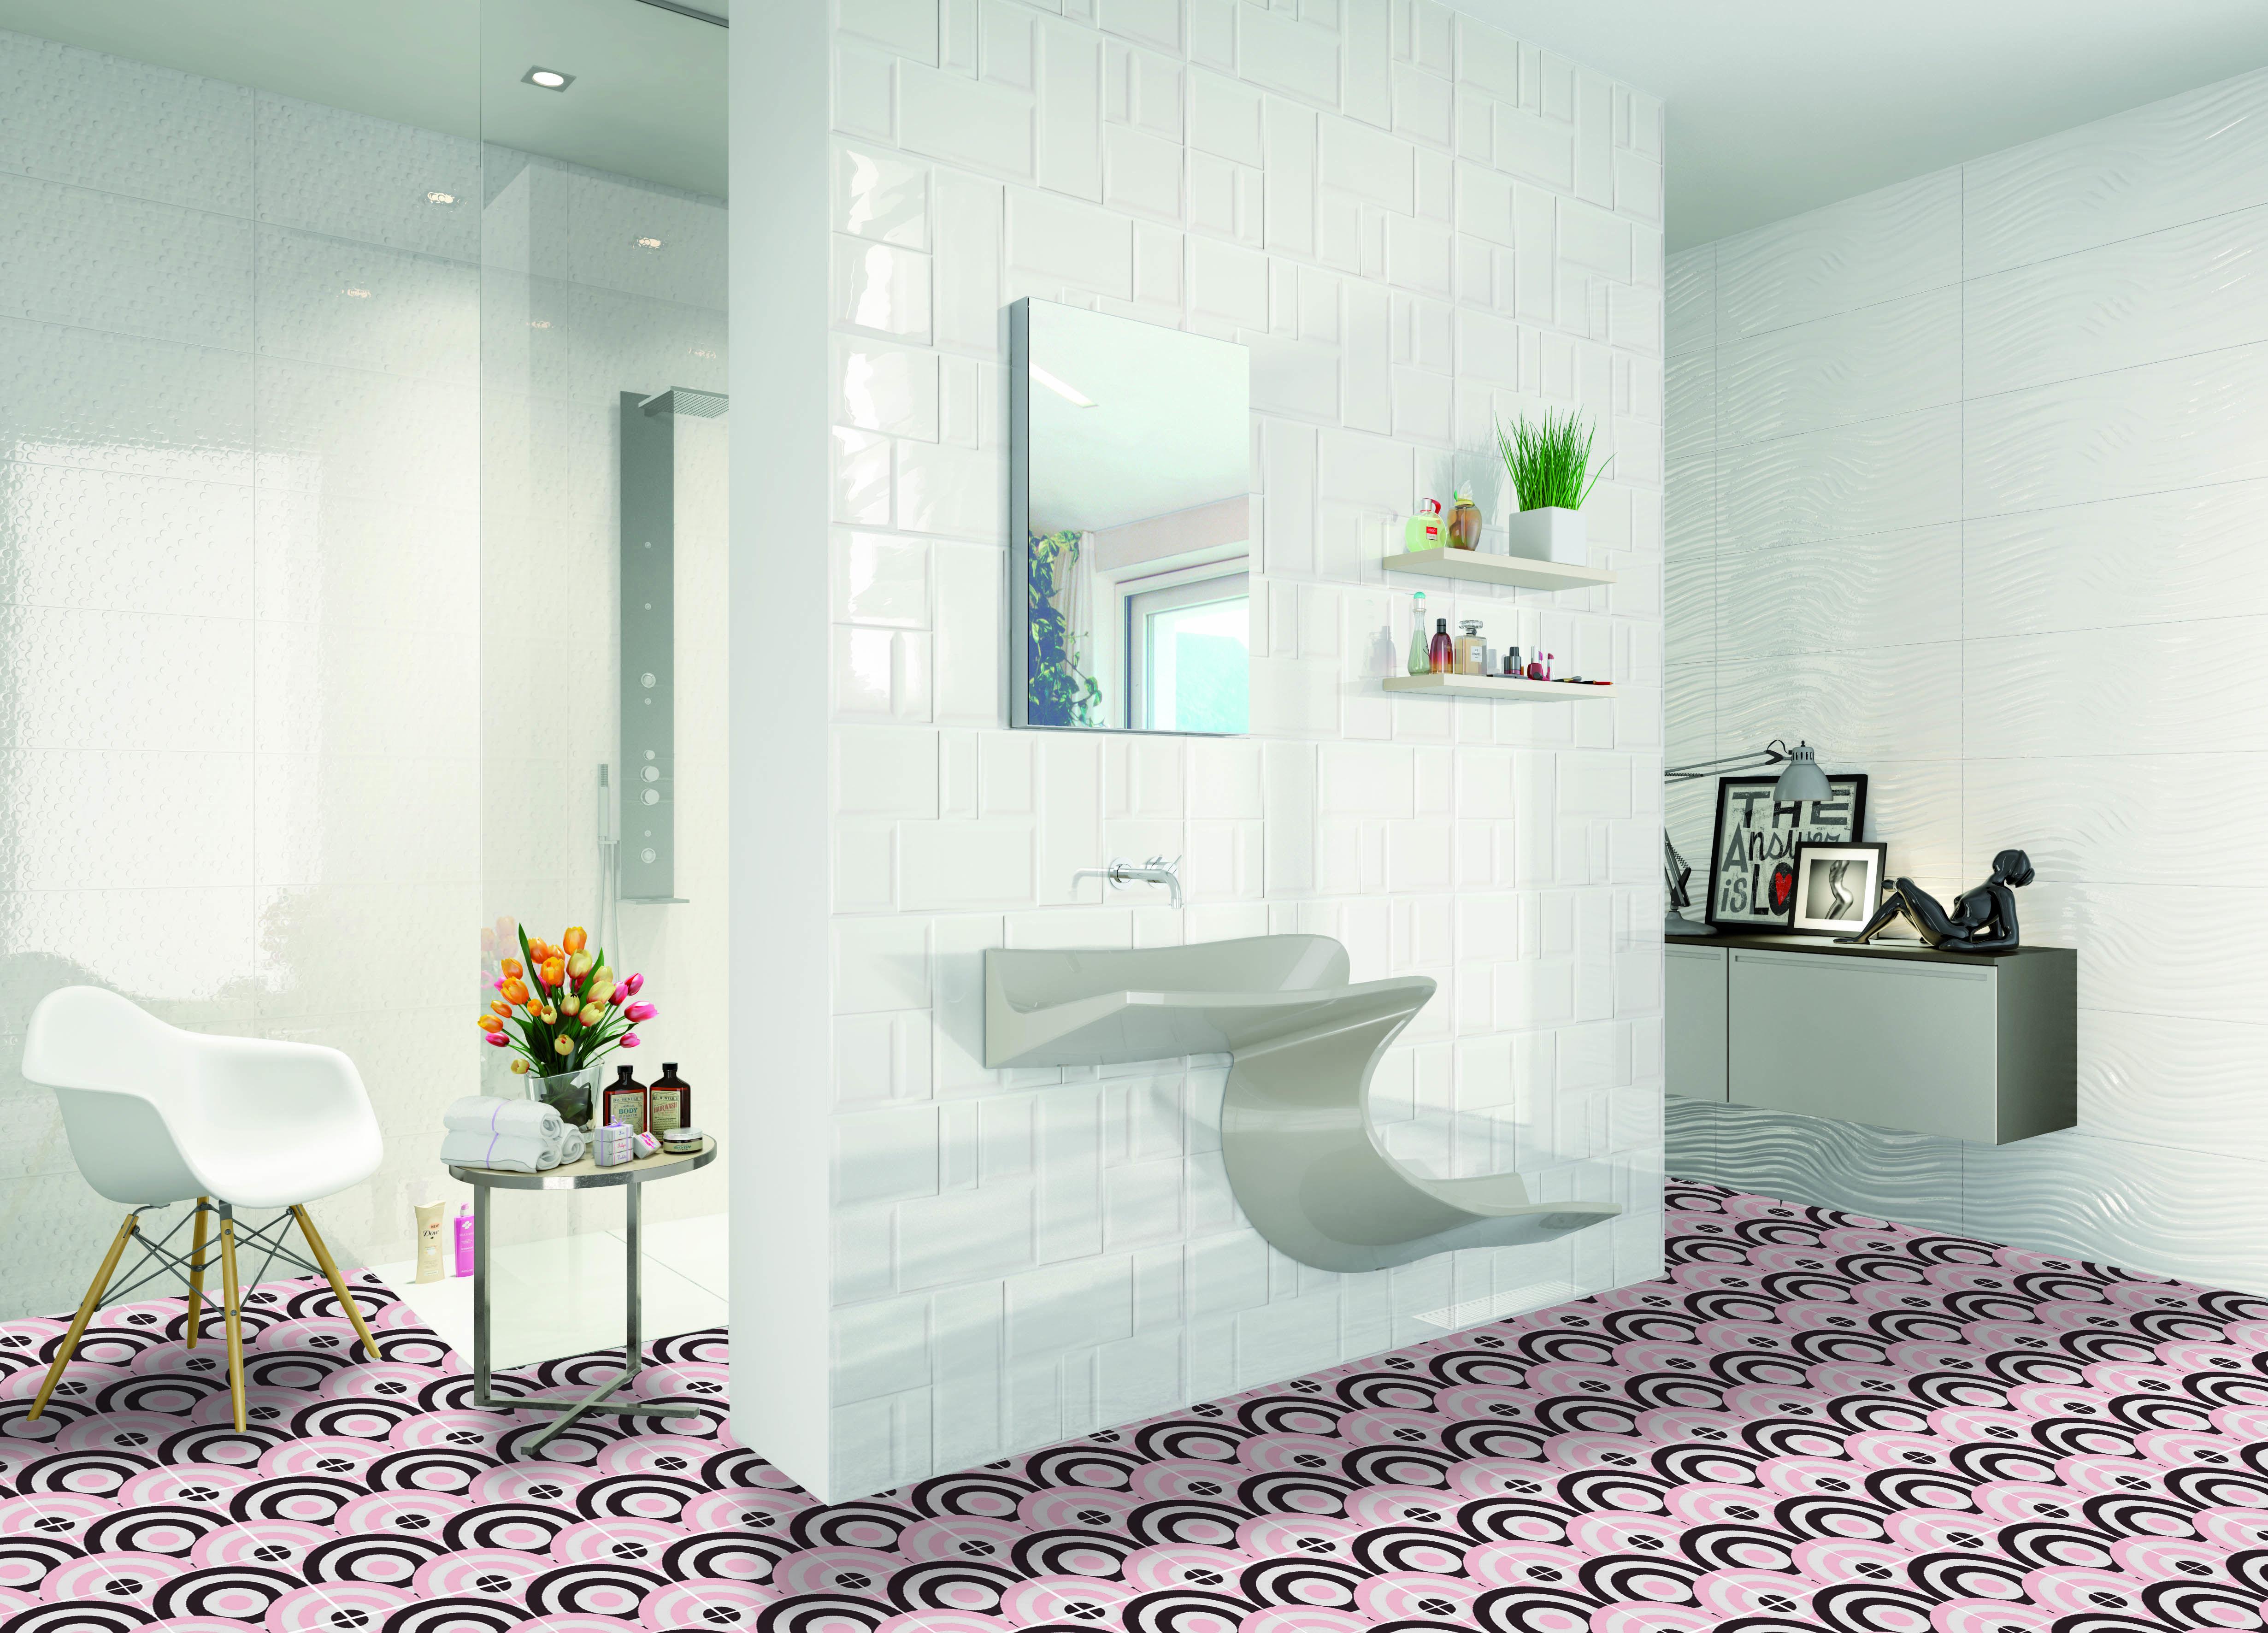 Salle De Bain Motif salle de bain motif tendance : m1832 format 20 x 20 cm